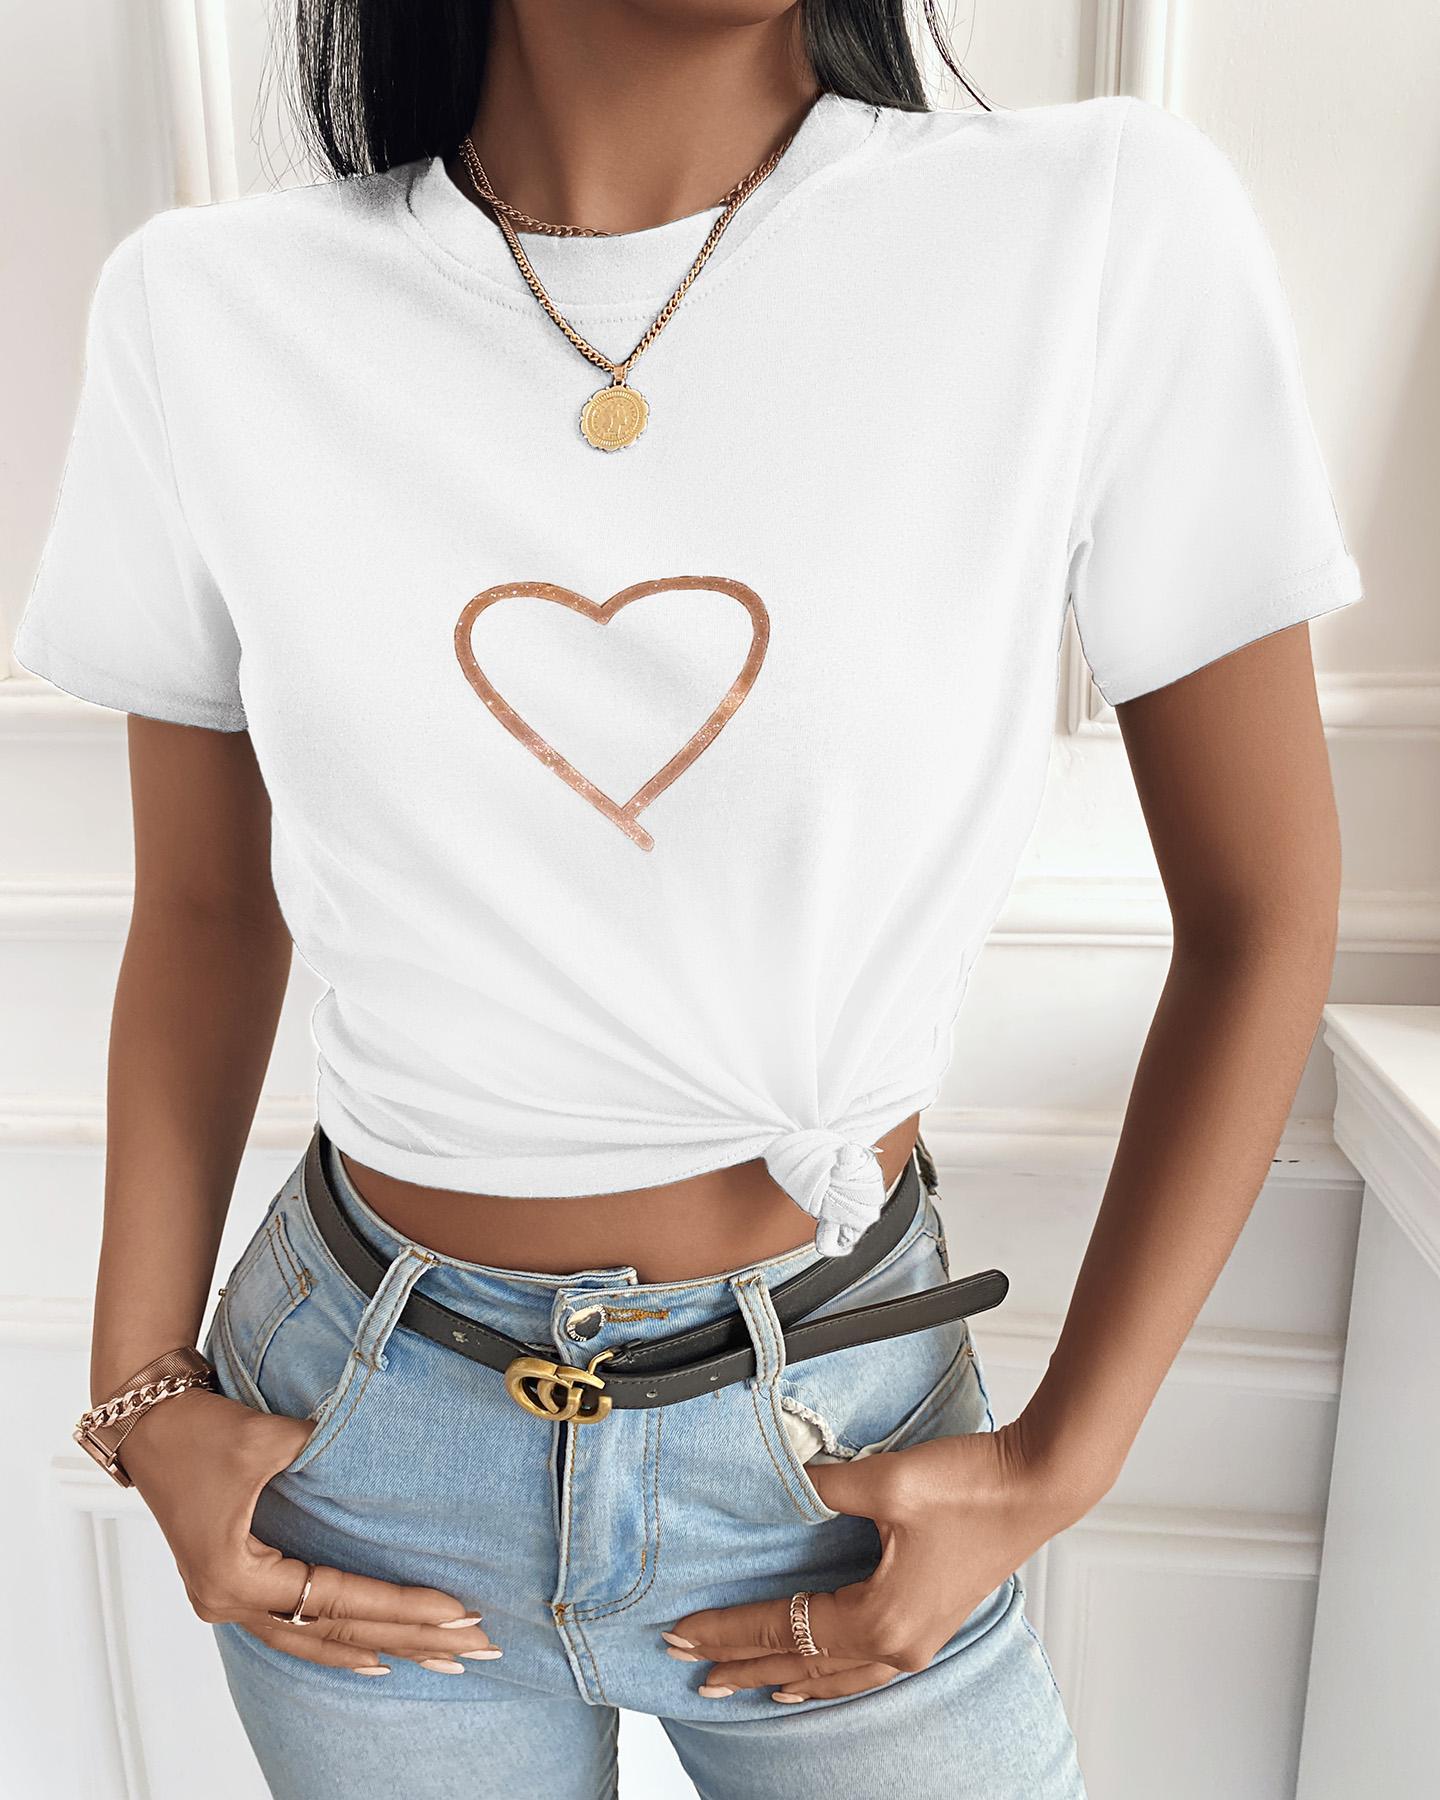 Heart Print Short Sleeve Casual T-shirt